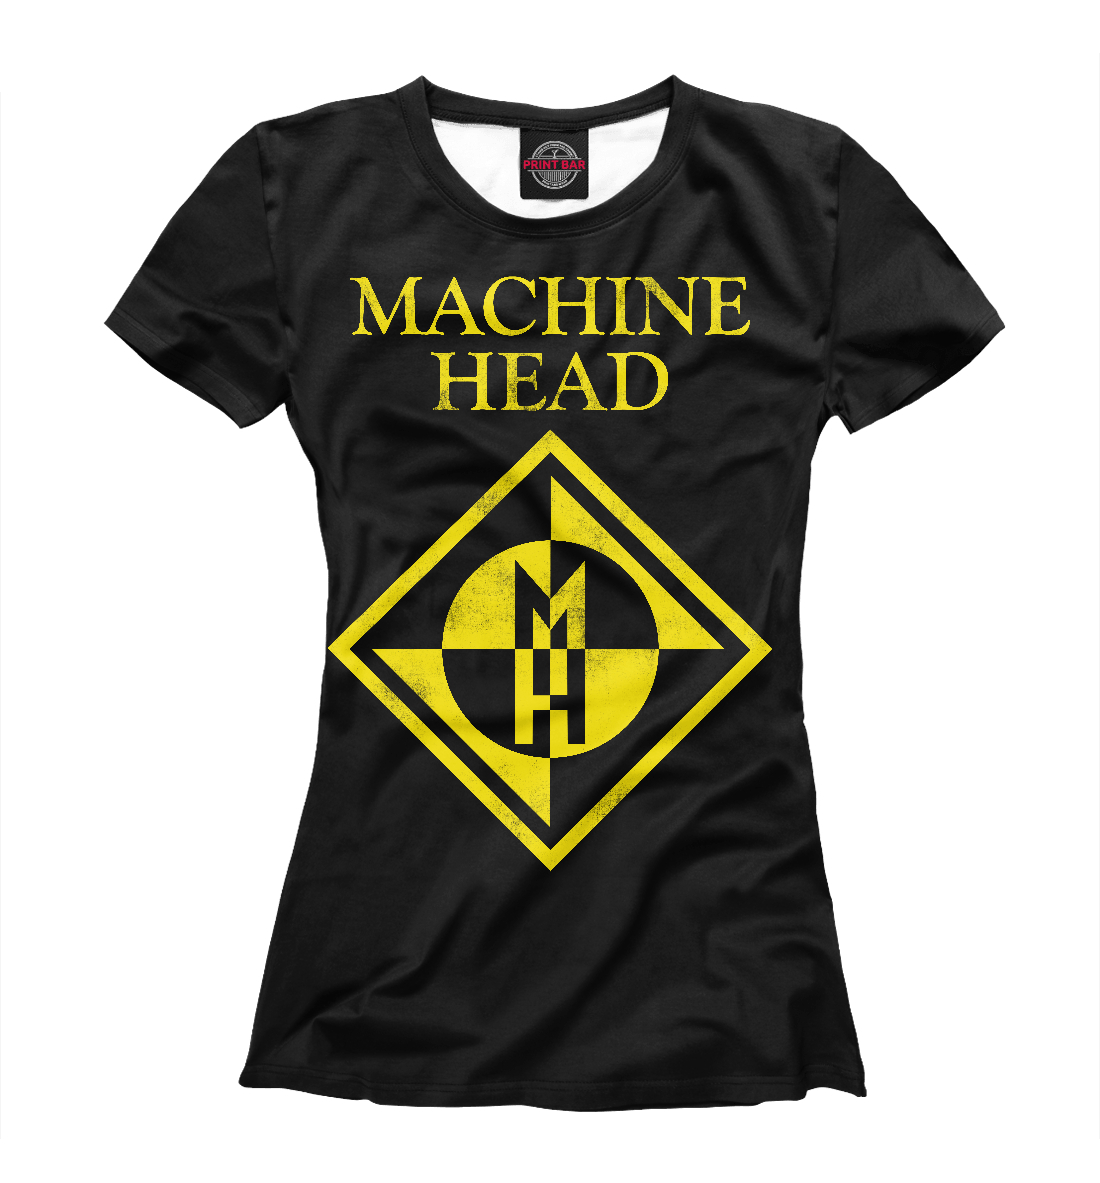 Купить Machine Head, Printbar, Футболки, MZK-410992-fut-1